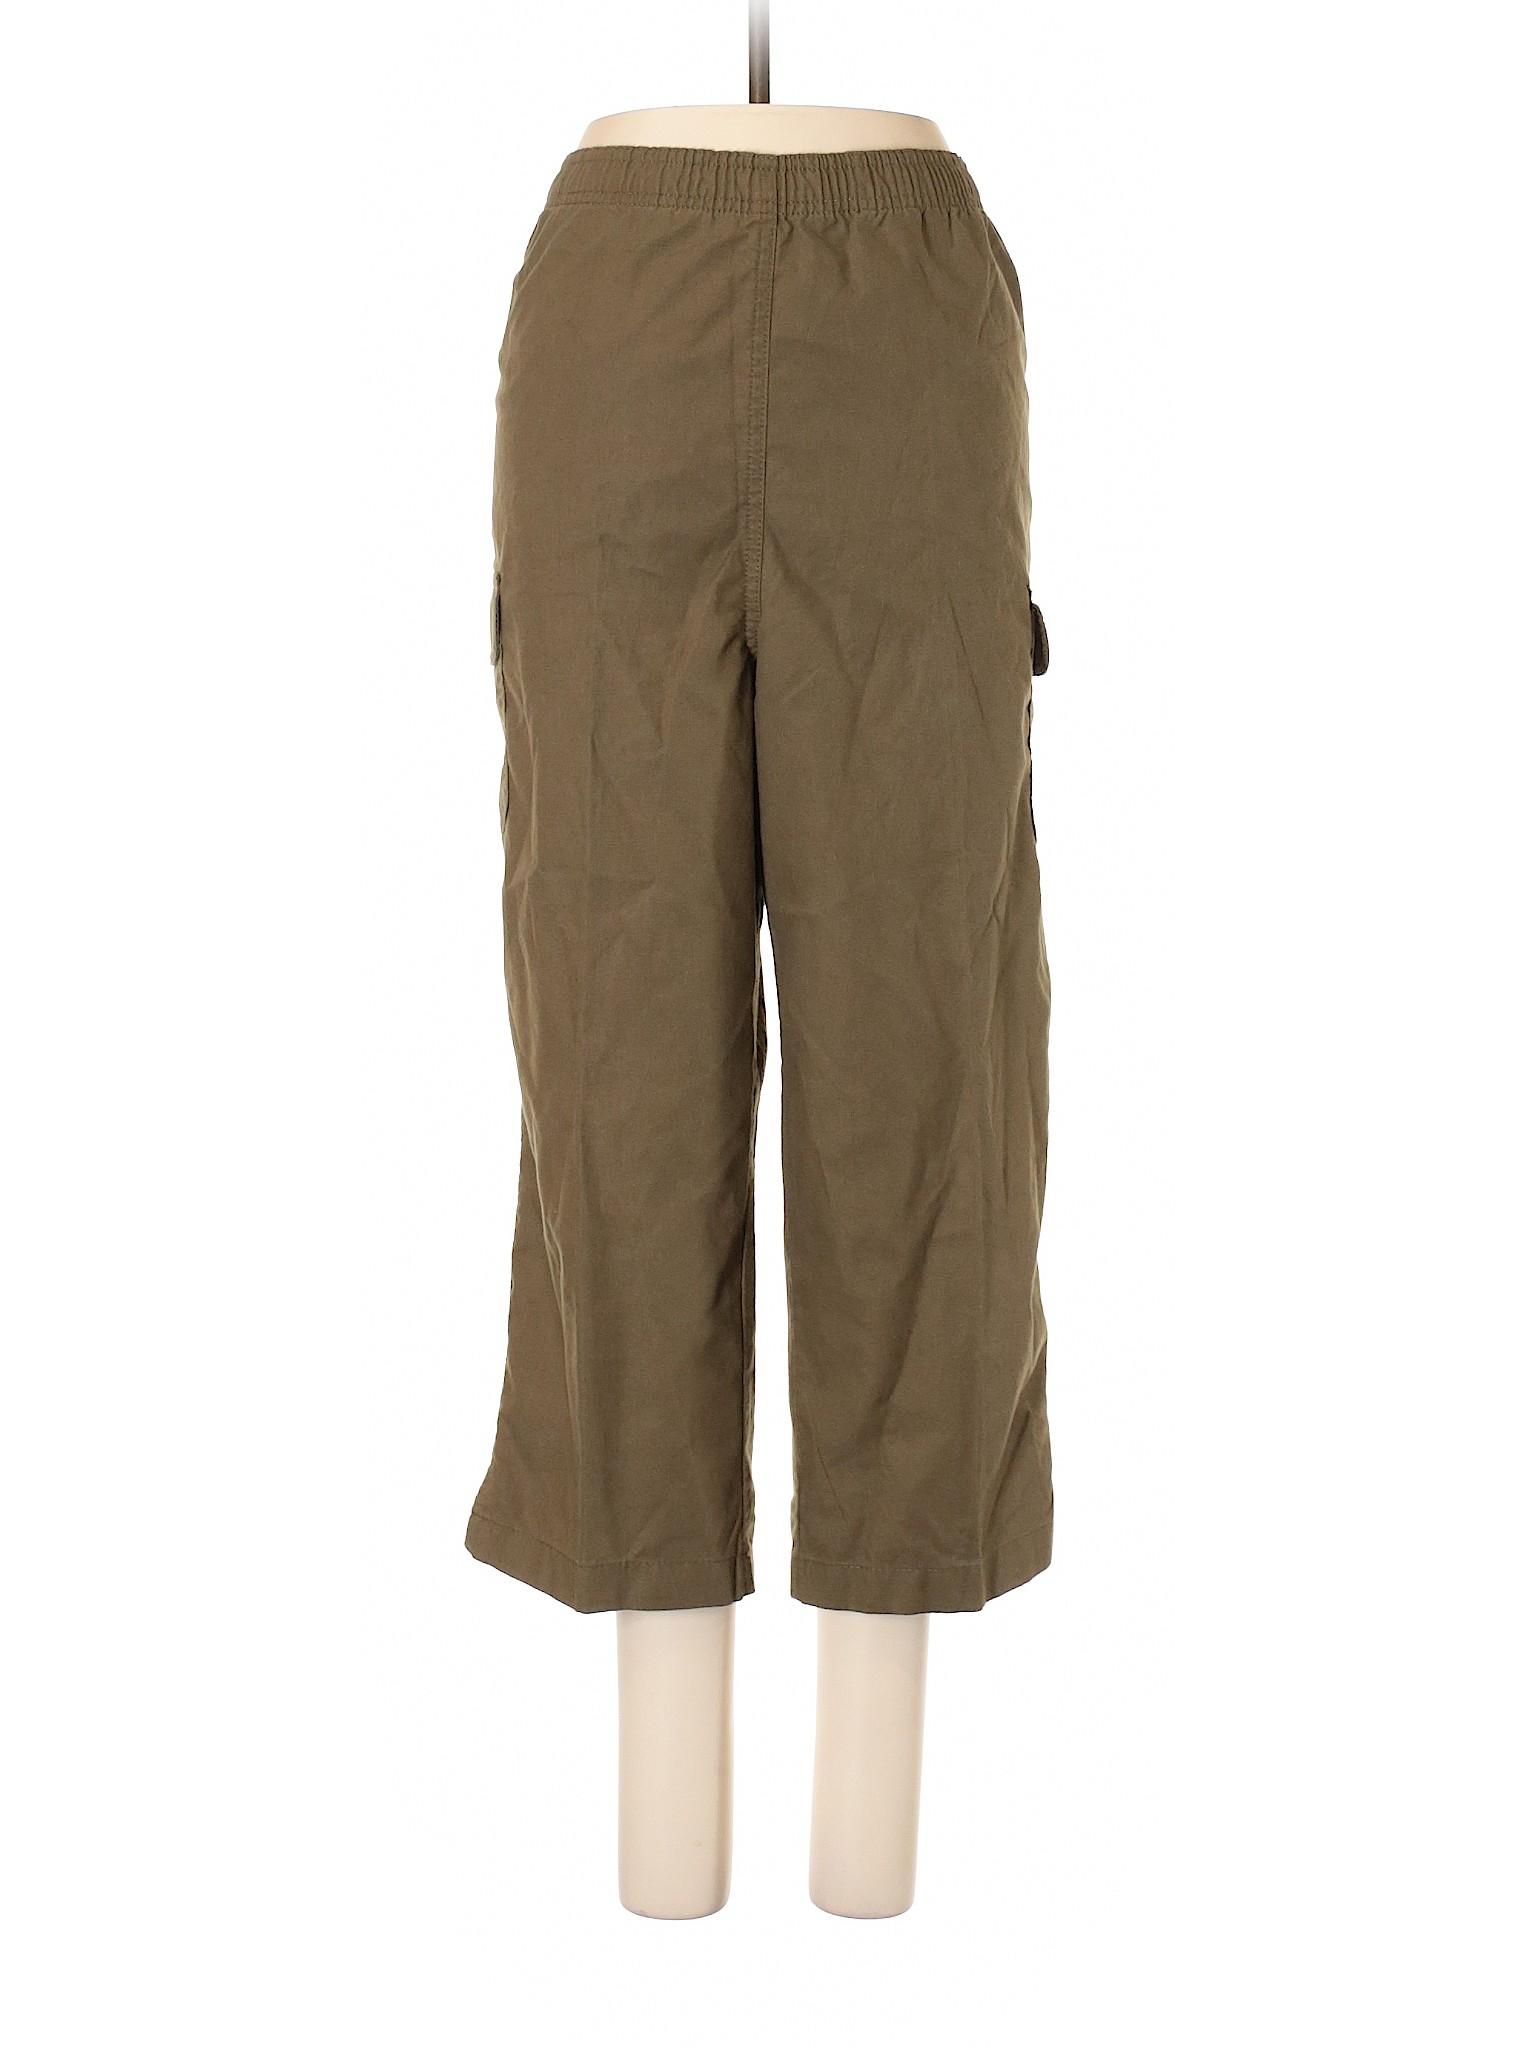 Boutique Cargo Pants amp; winter Hasting Smith BRnwxqYHRC